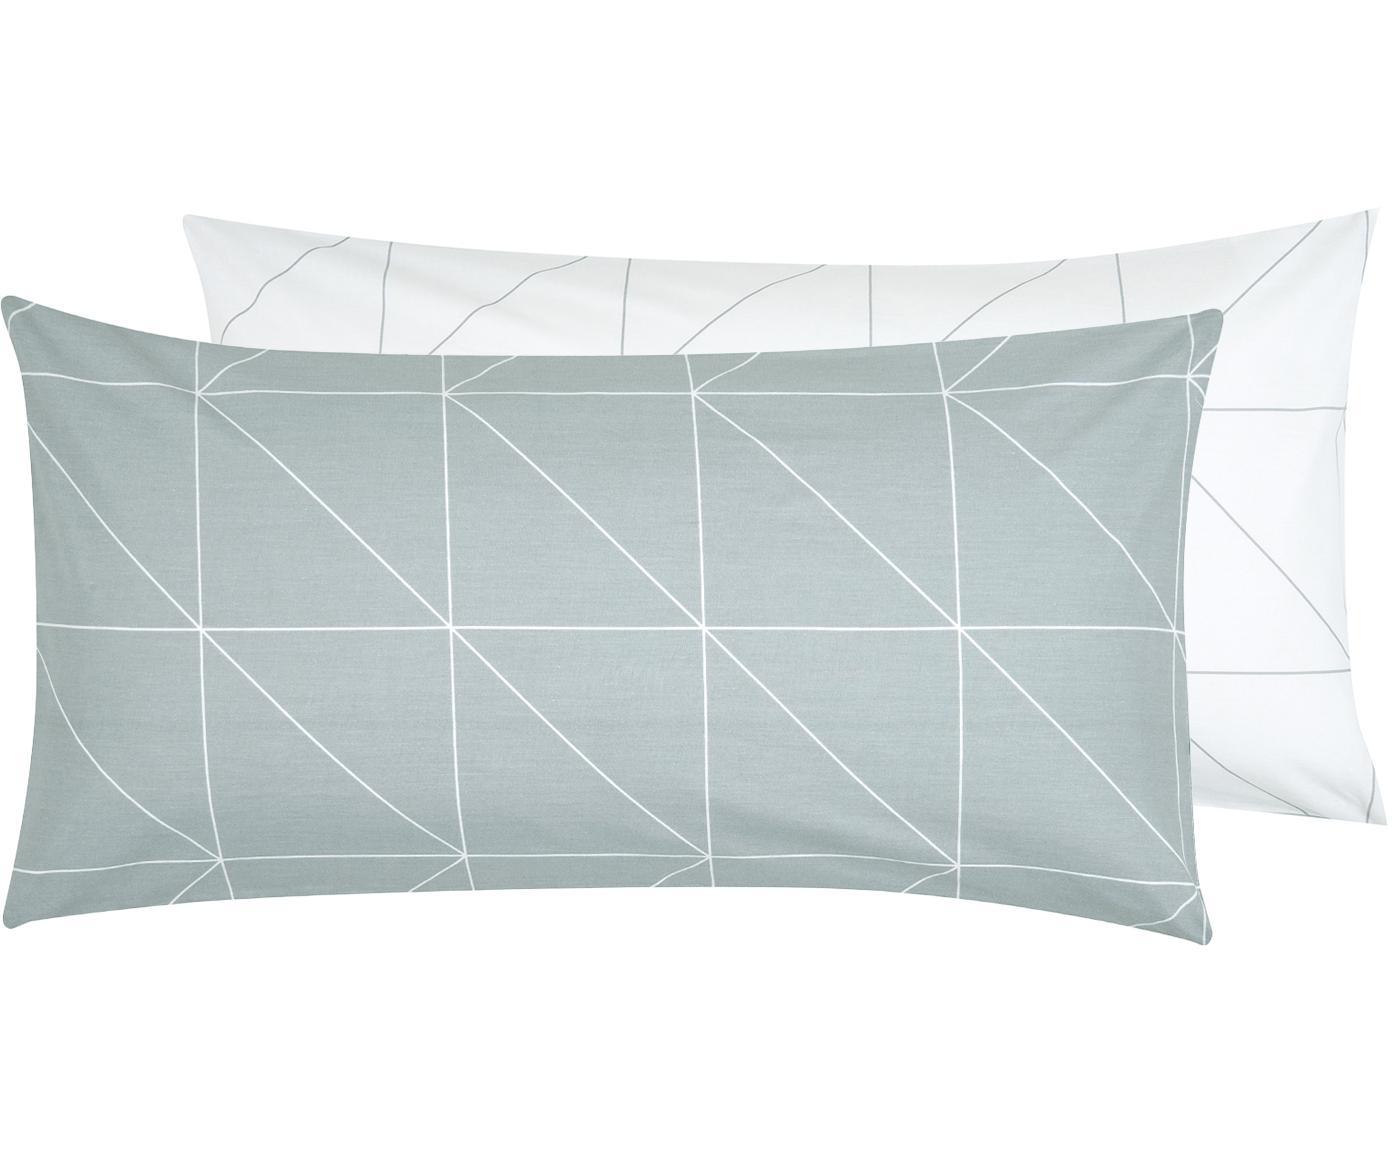 Funda de almohada de tejido renforcé Marla, caras distintas, Verde salvia, blanco crema, An 45 x L 85 cm